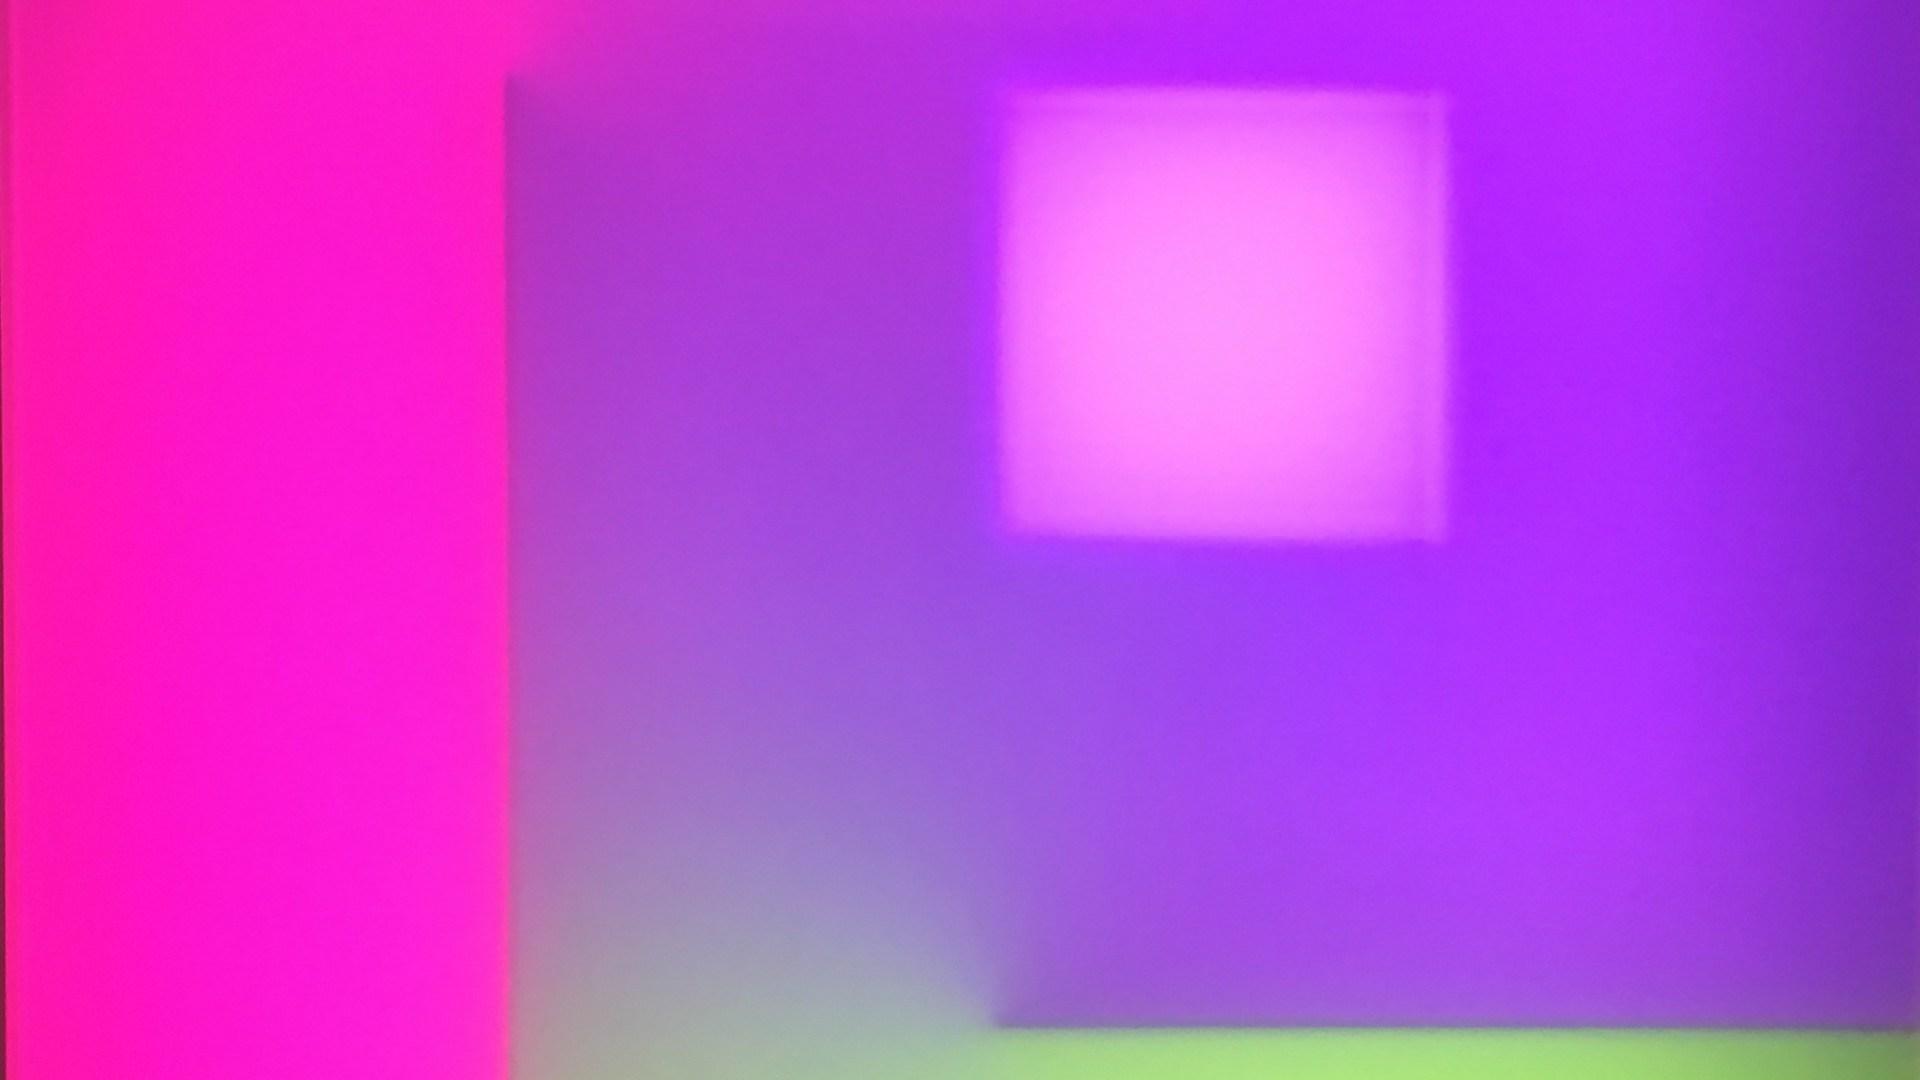 brian_eno_floating_square